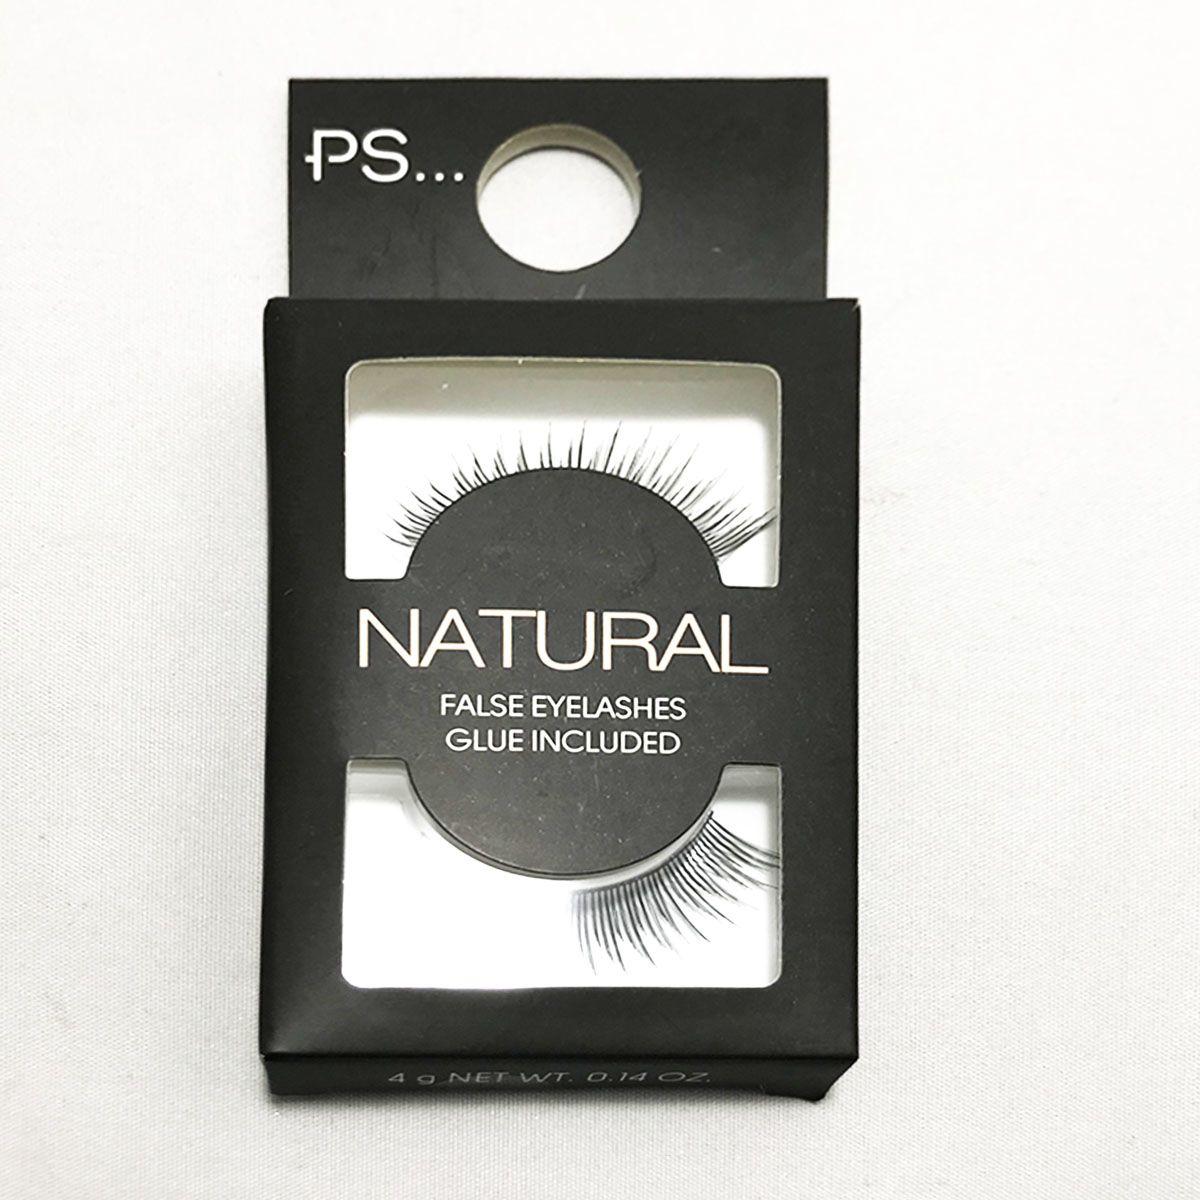 Primark Natural False Eyelashes Glue Included